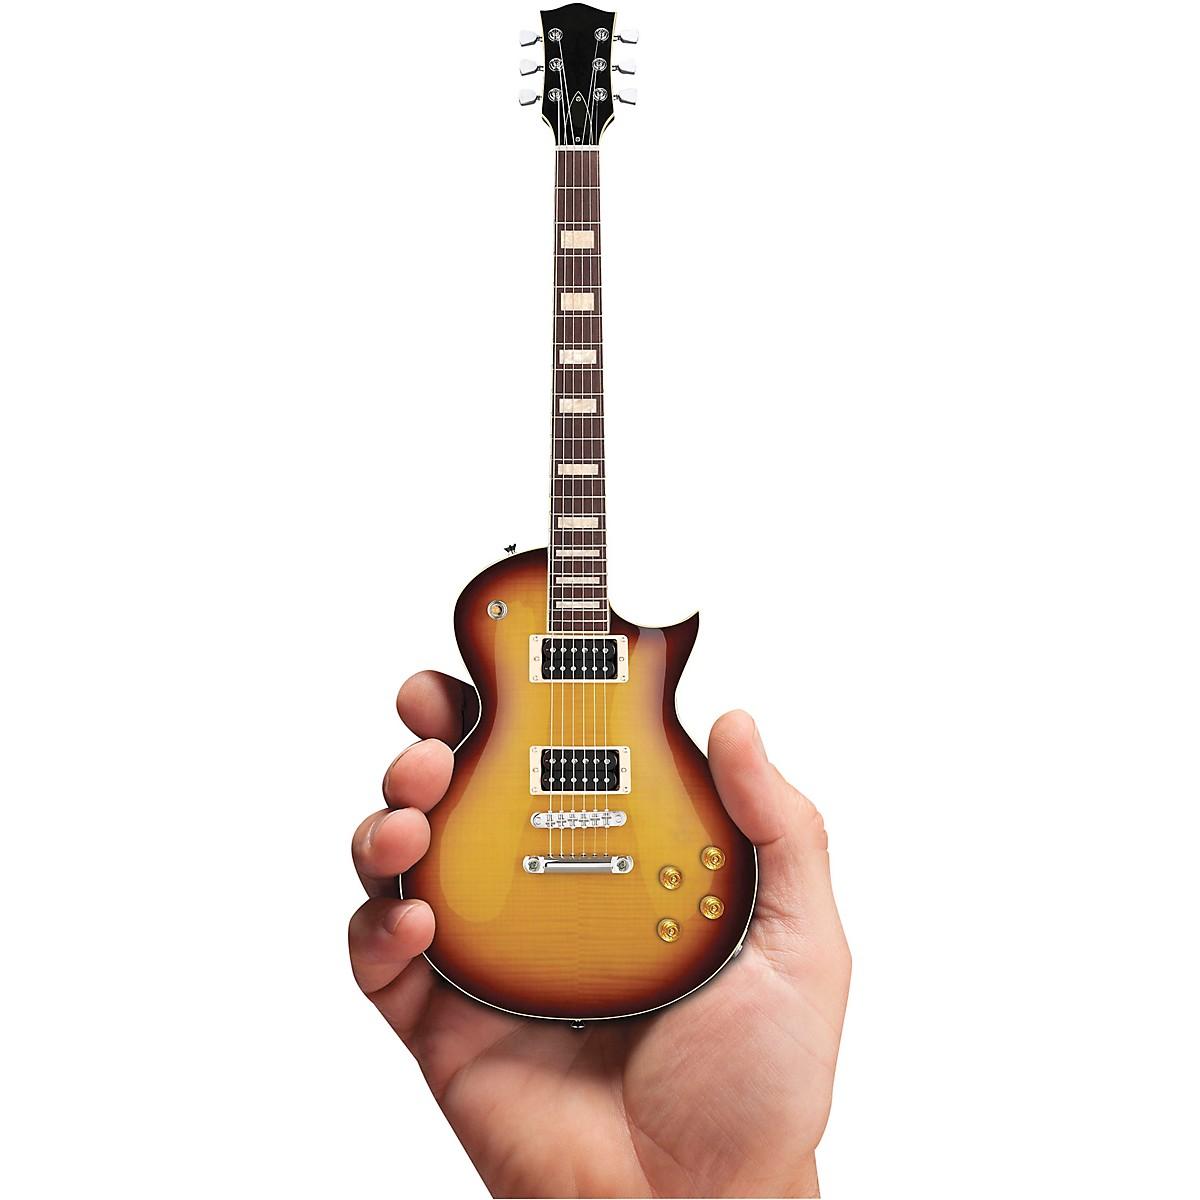 Axe Heaven Classic Tobacco Sunburst Electric Guitar Officially Licensed Miniature Guitar Replica